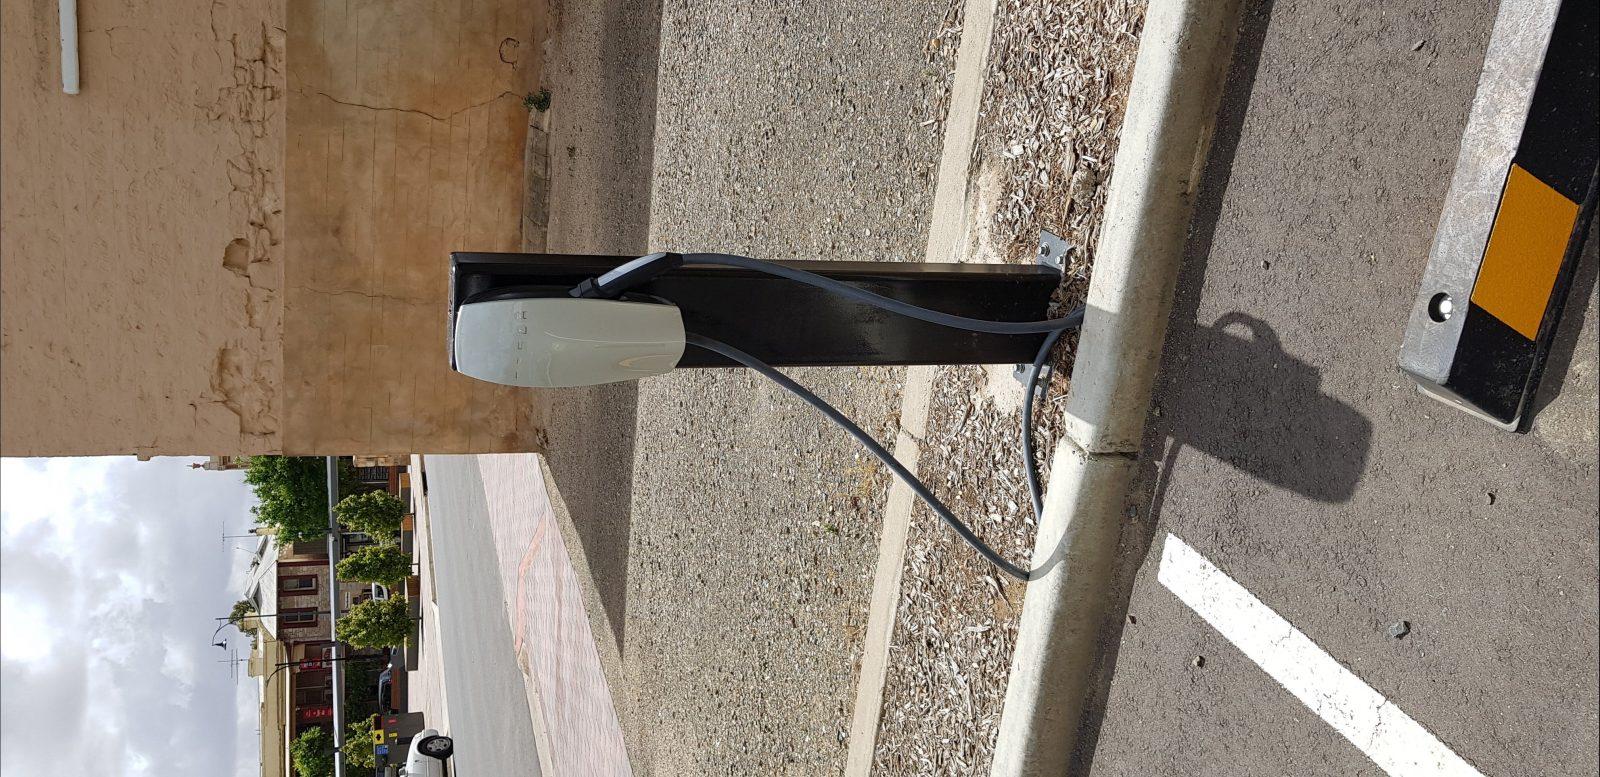 Kapunda Electric Vehicle Charging Point